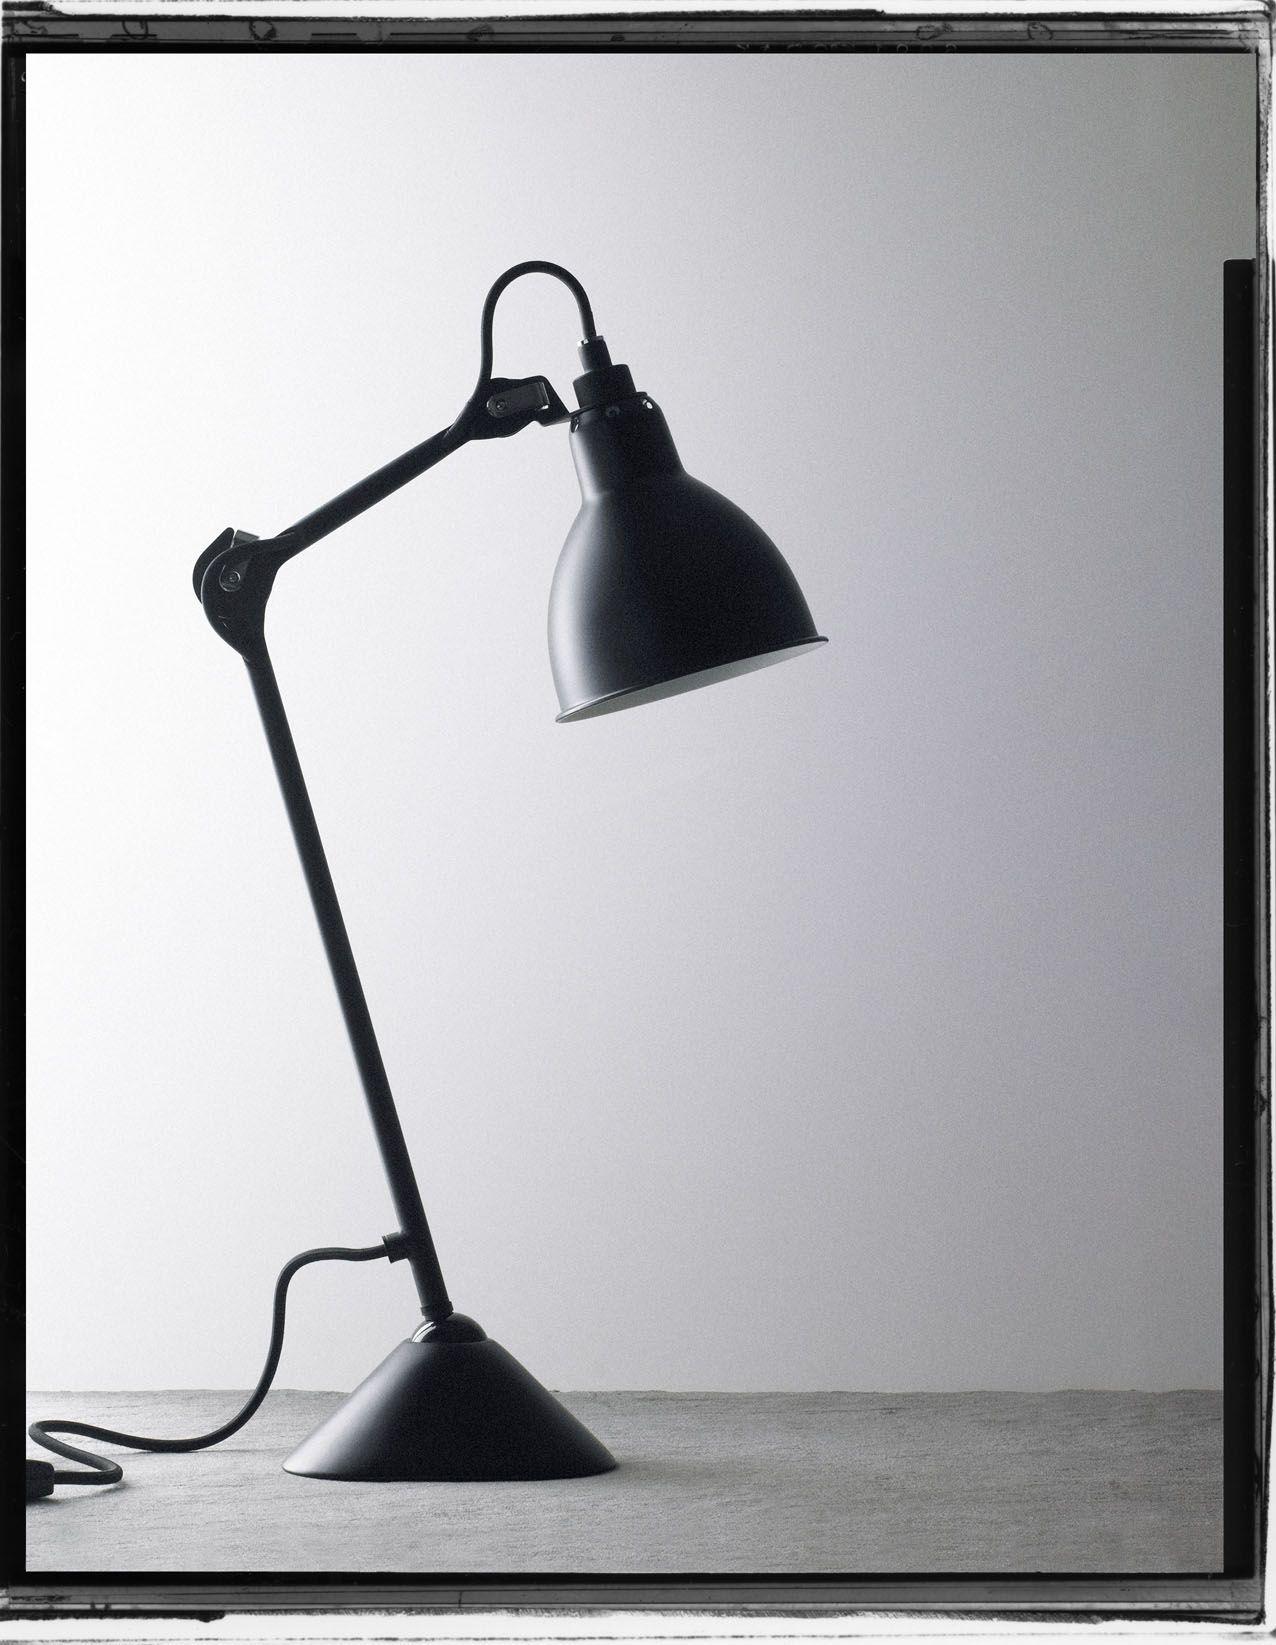 59 Bed Lampe No At From Arbotante GrasMaster La VSUpMz